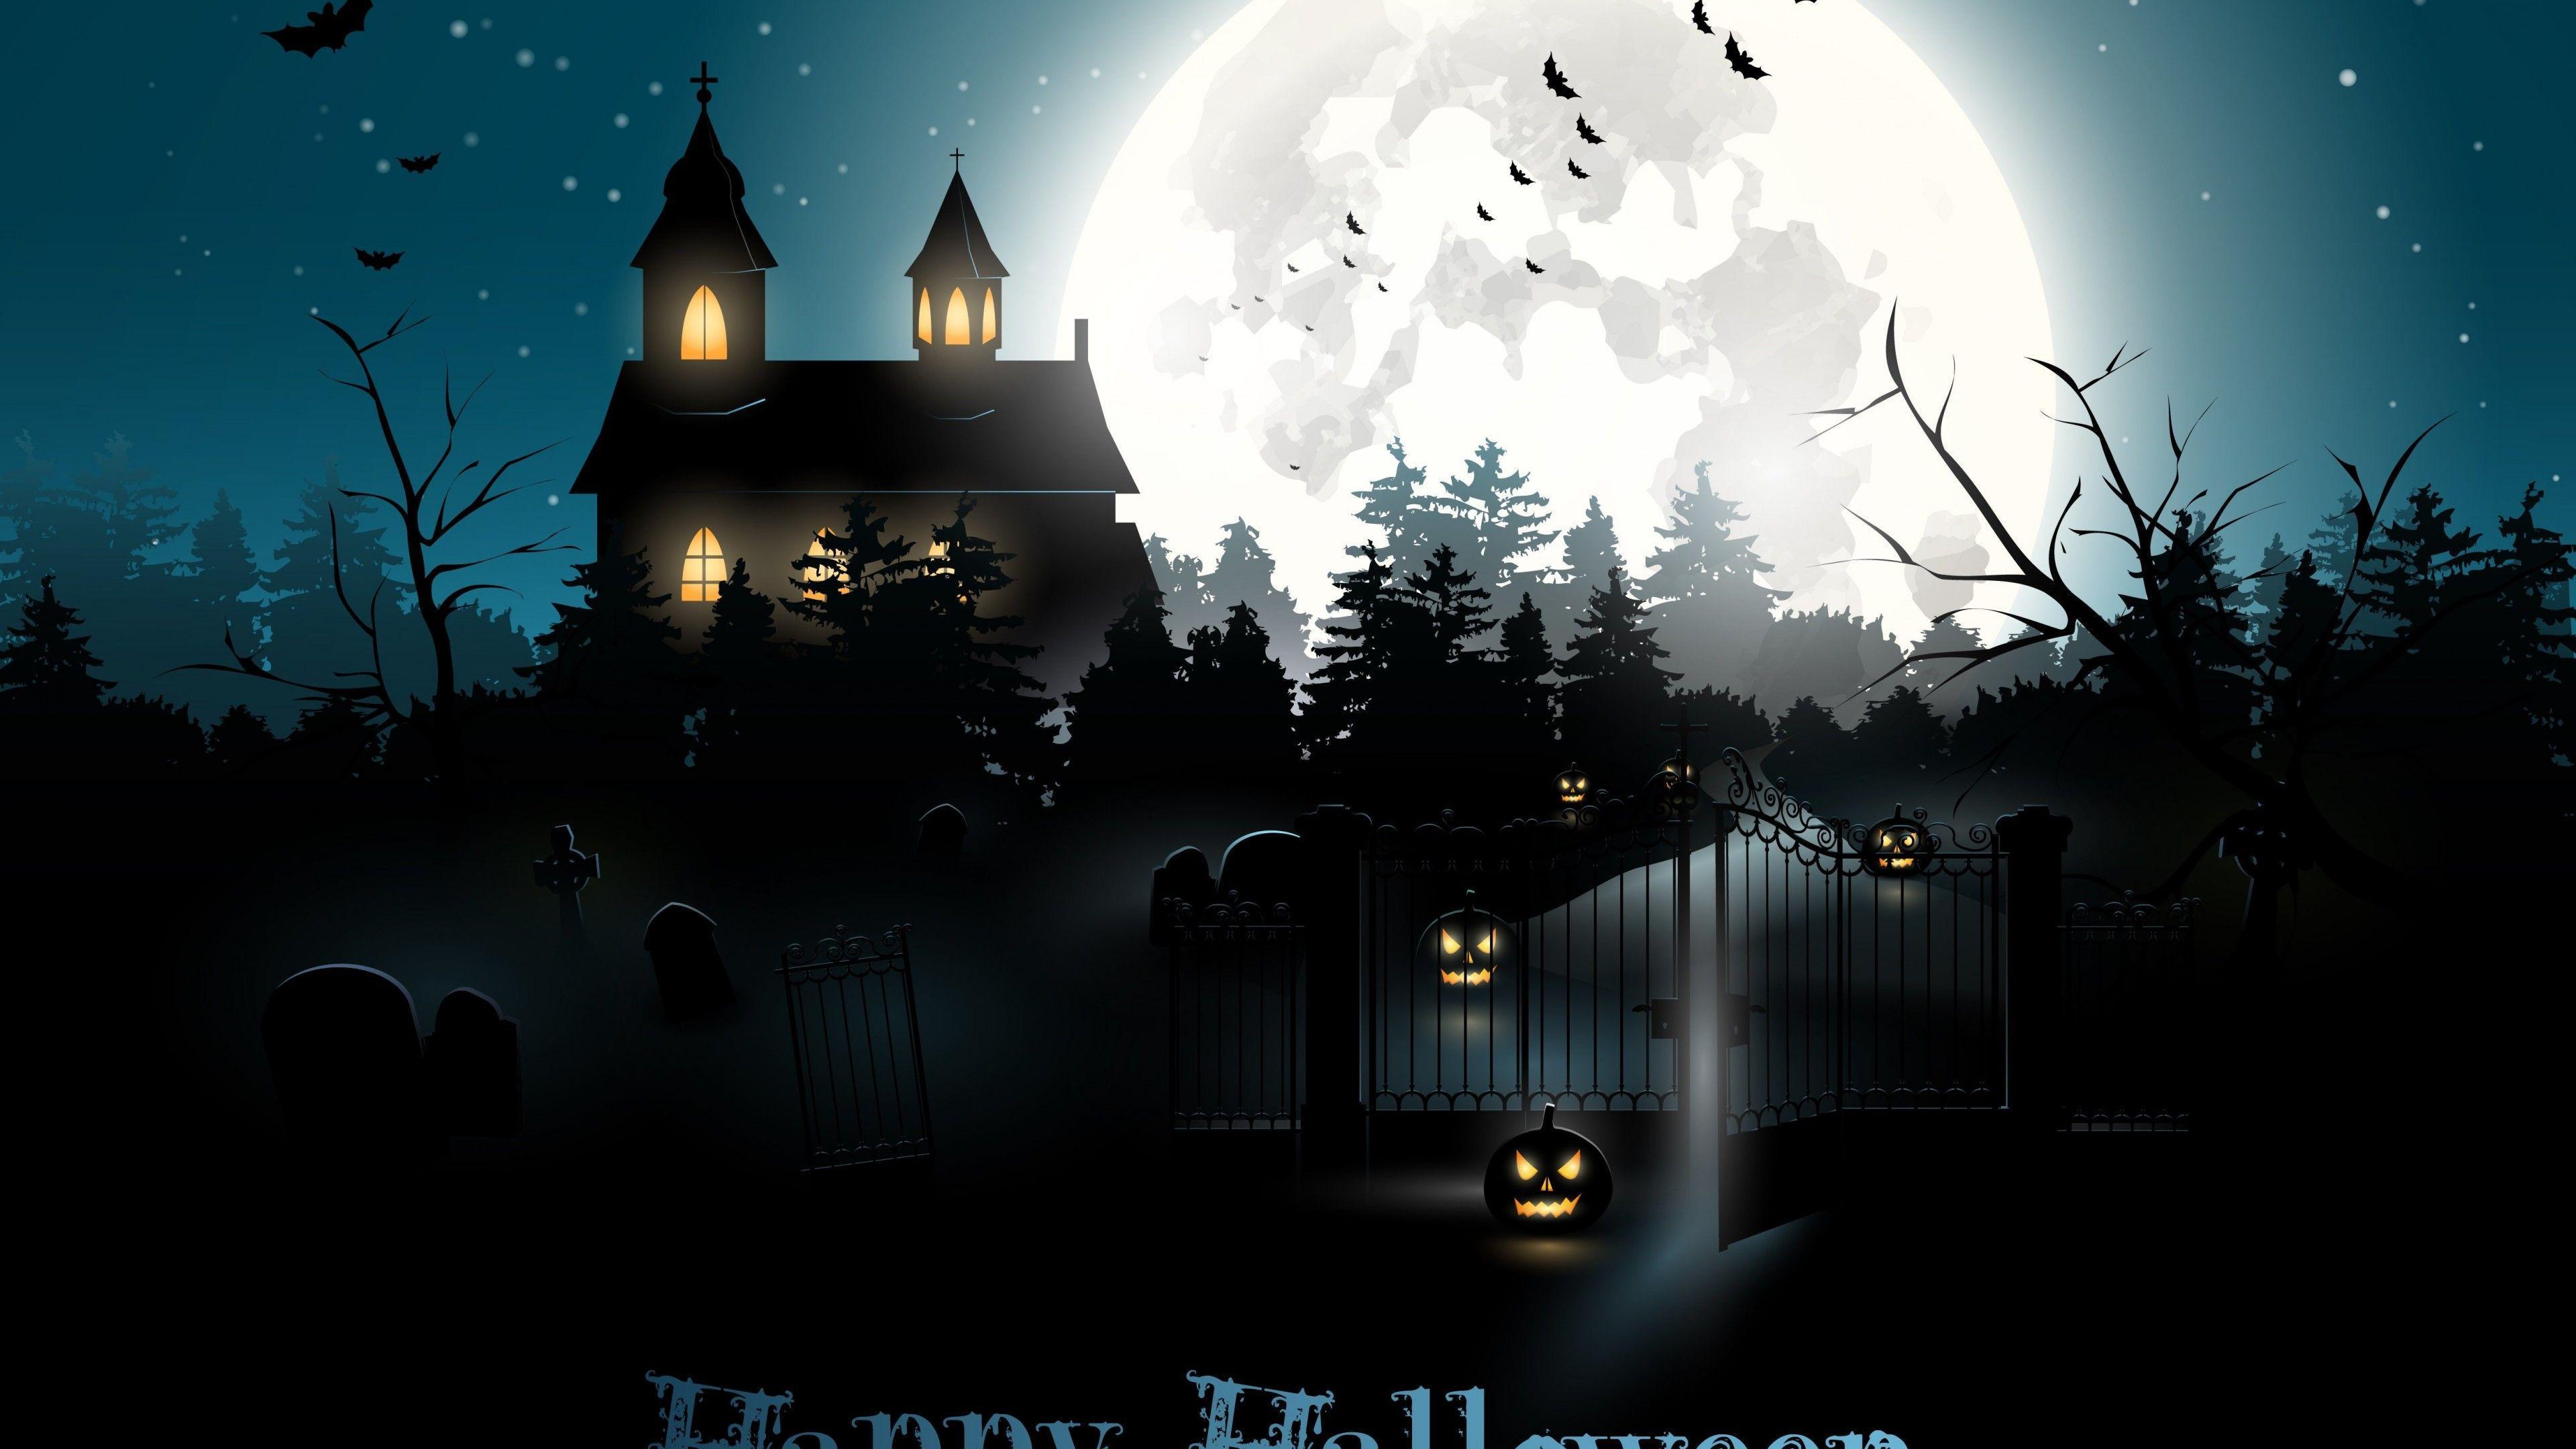 Halloween Moon Wallpapers Top Free Halloween Moon Backgrounds Wallpaperaccess